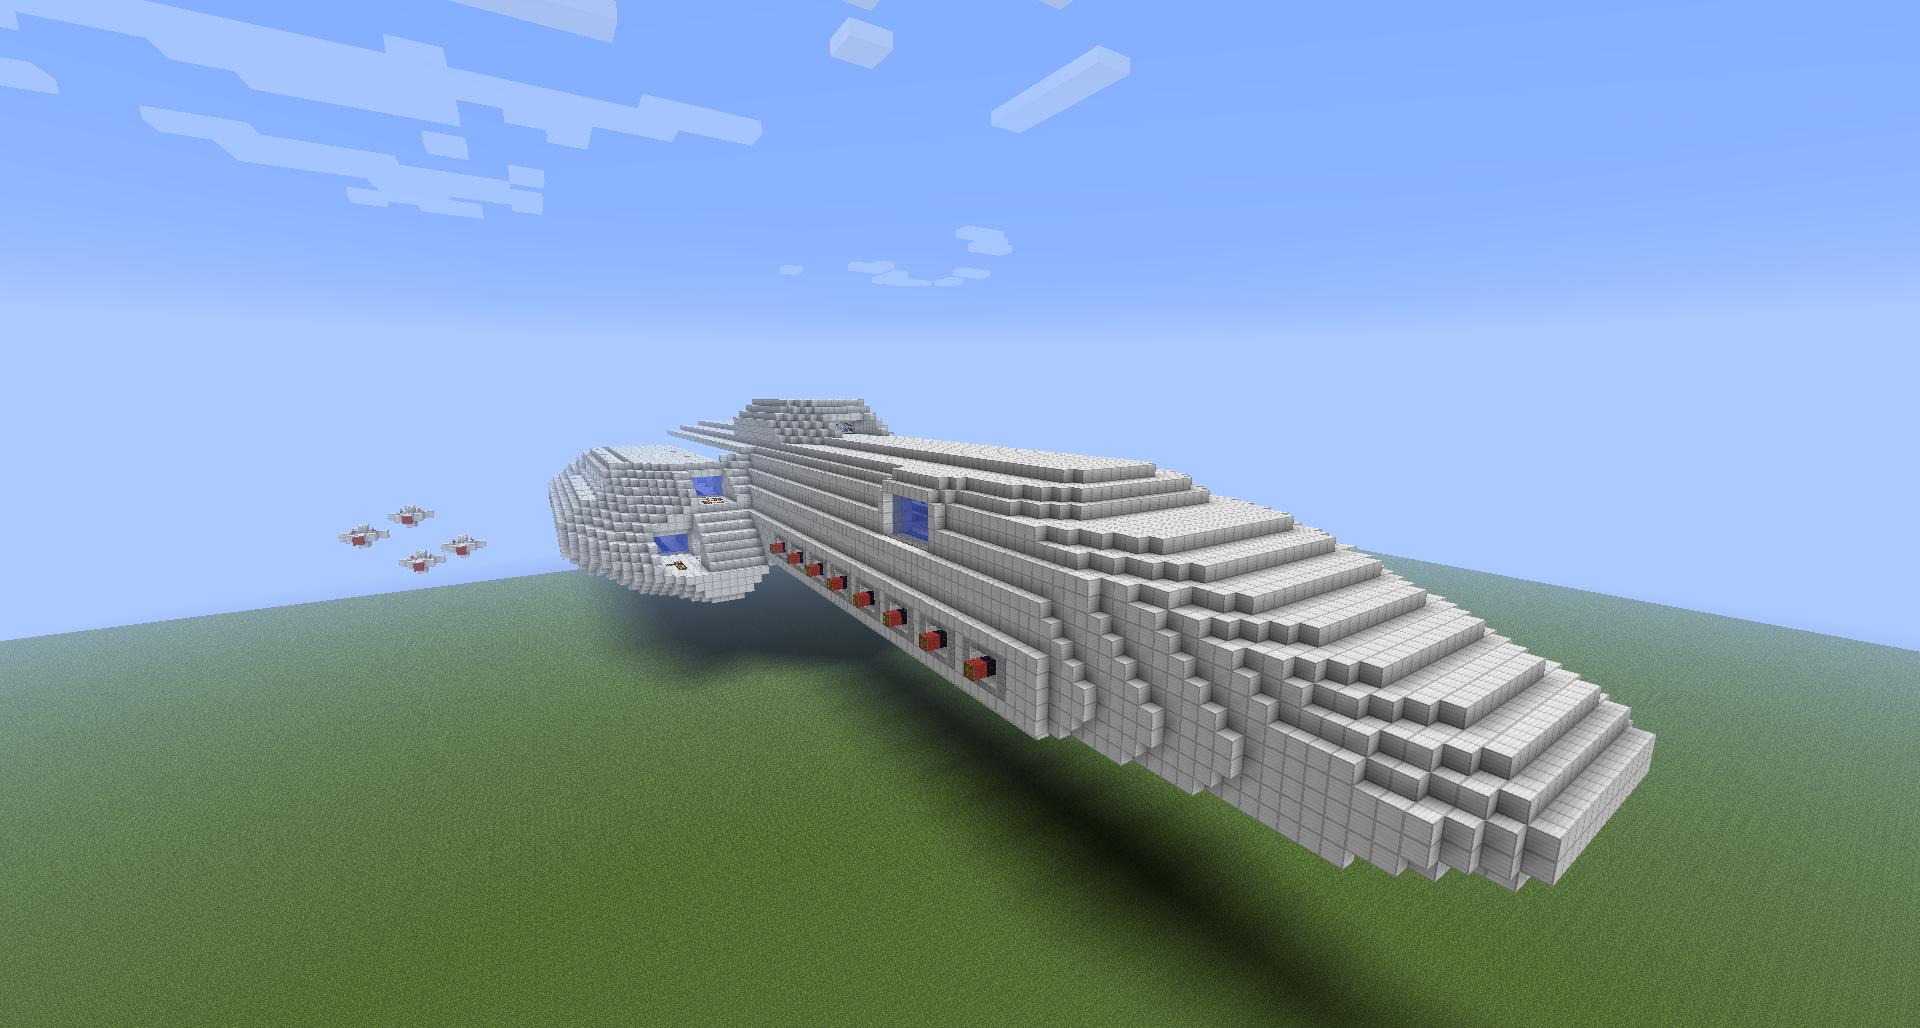 Minecraft Spaceships Wip] spaceship [no name jet] - screenshots - show ...